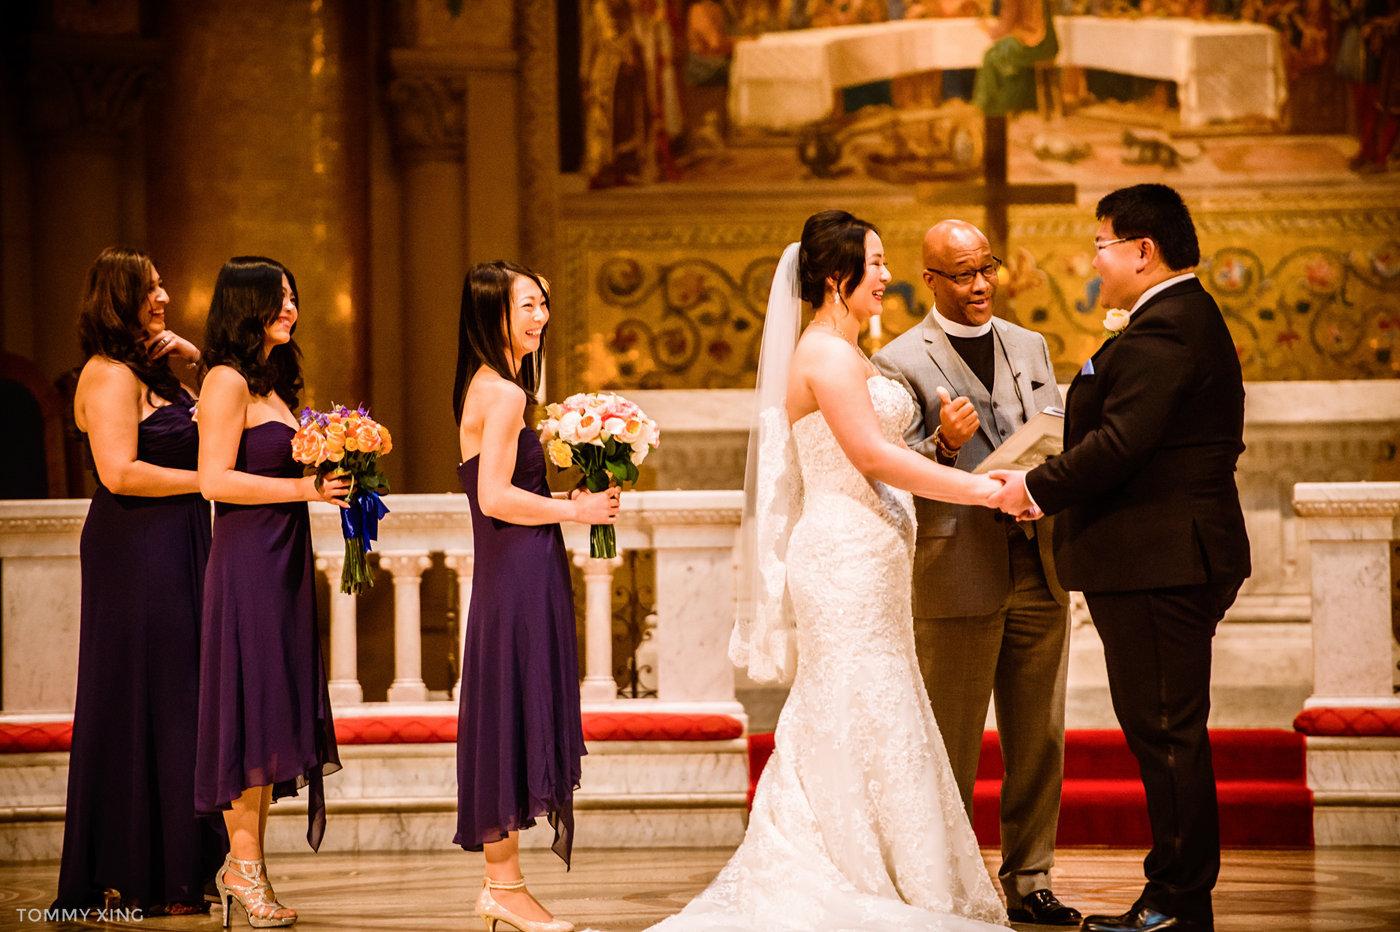 STANFORD MEMORIAL CHURCH WEDDING - Wenjie & Chengcheng - SAN FRANCISCO BAY AREA 斯坦福教堂婚礼跟拍 - 洛杉矶婚礼婚纱照摄影师 Tommy Xing Photography096.jpg